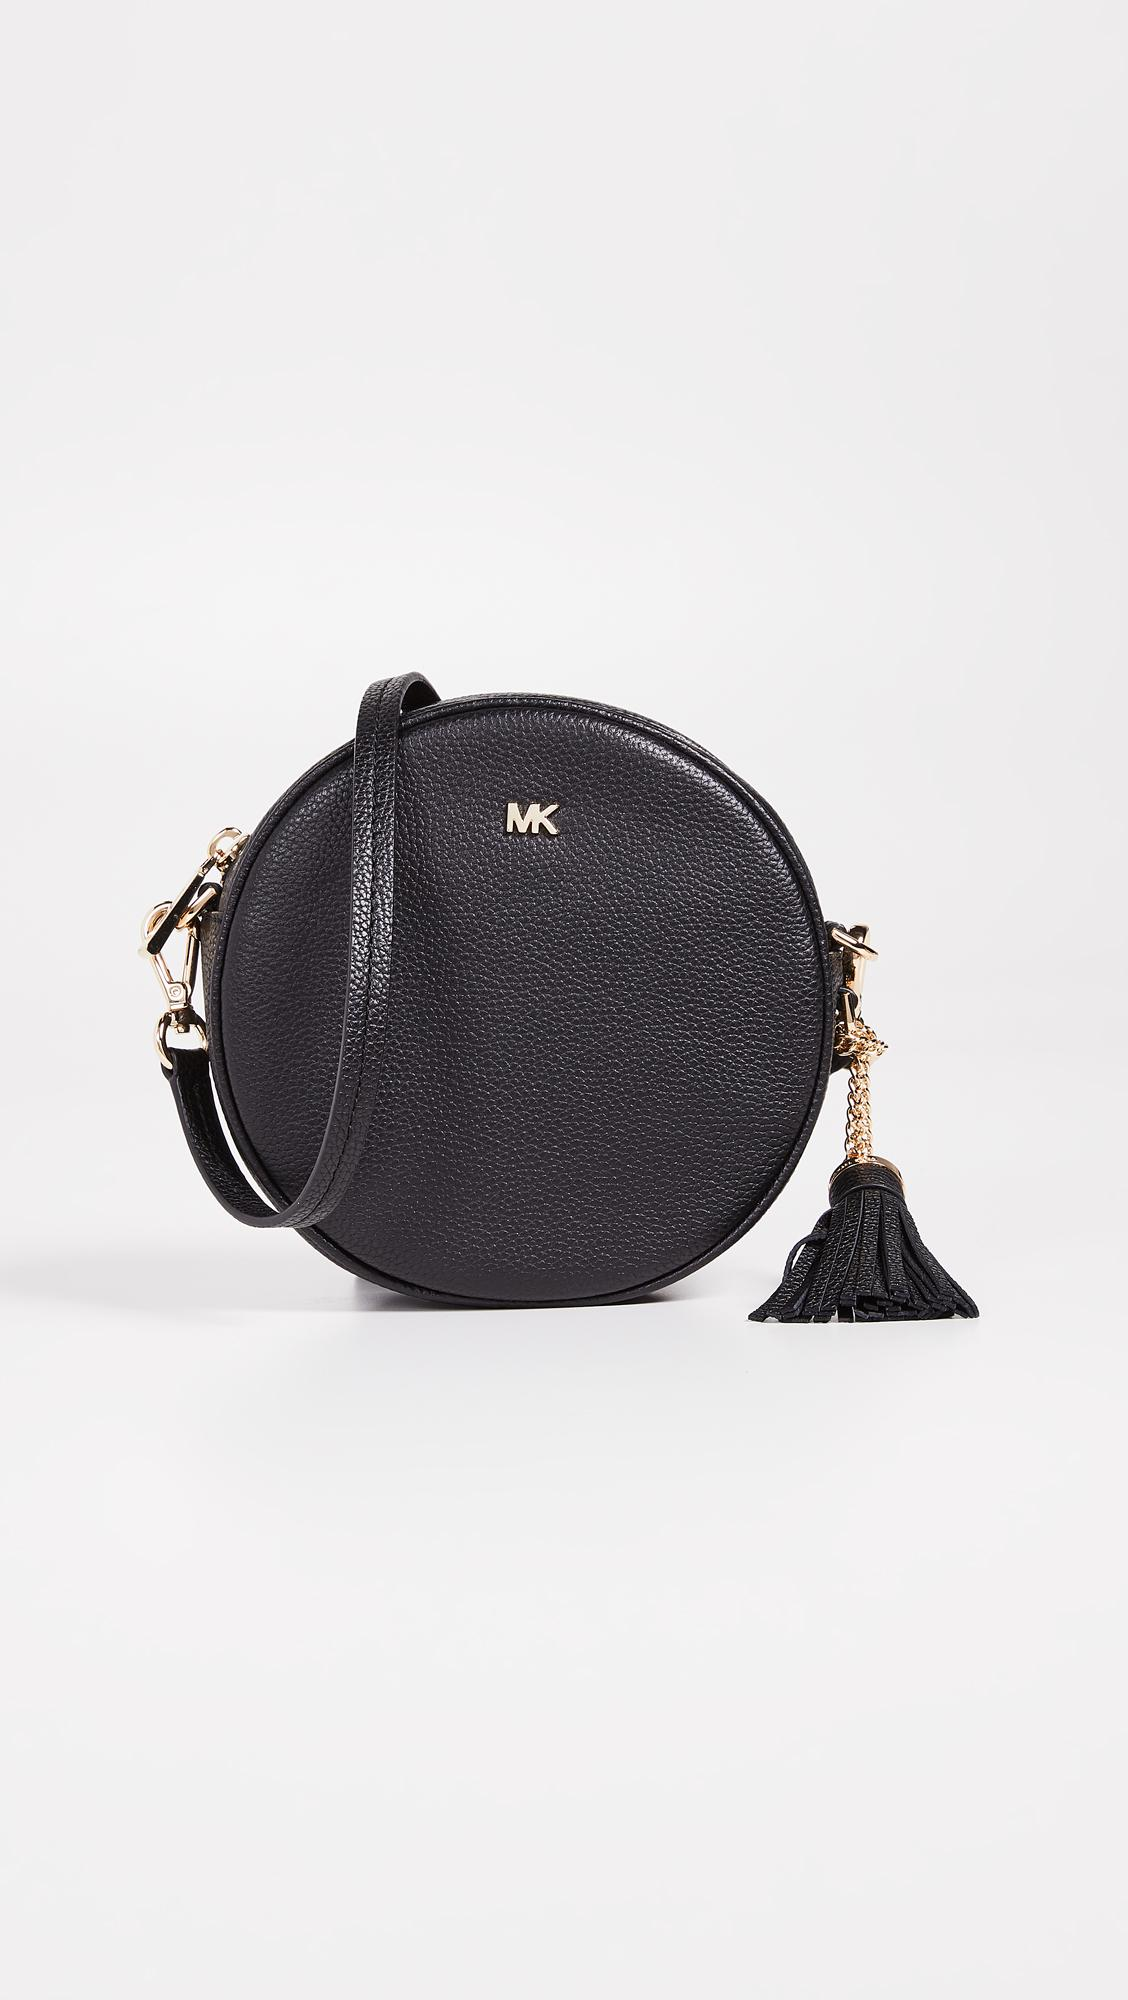 553e997a5cfc5 Michael Michael Kors Medium Canteen Crossbody Bag in Black - Lyst